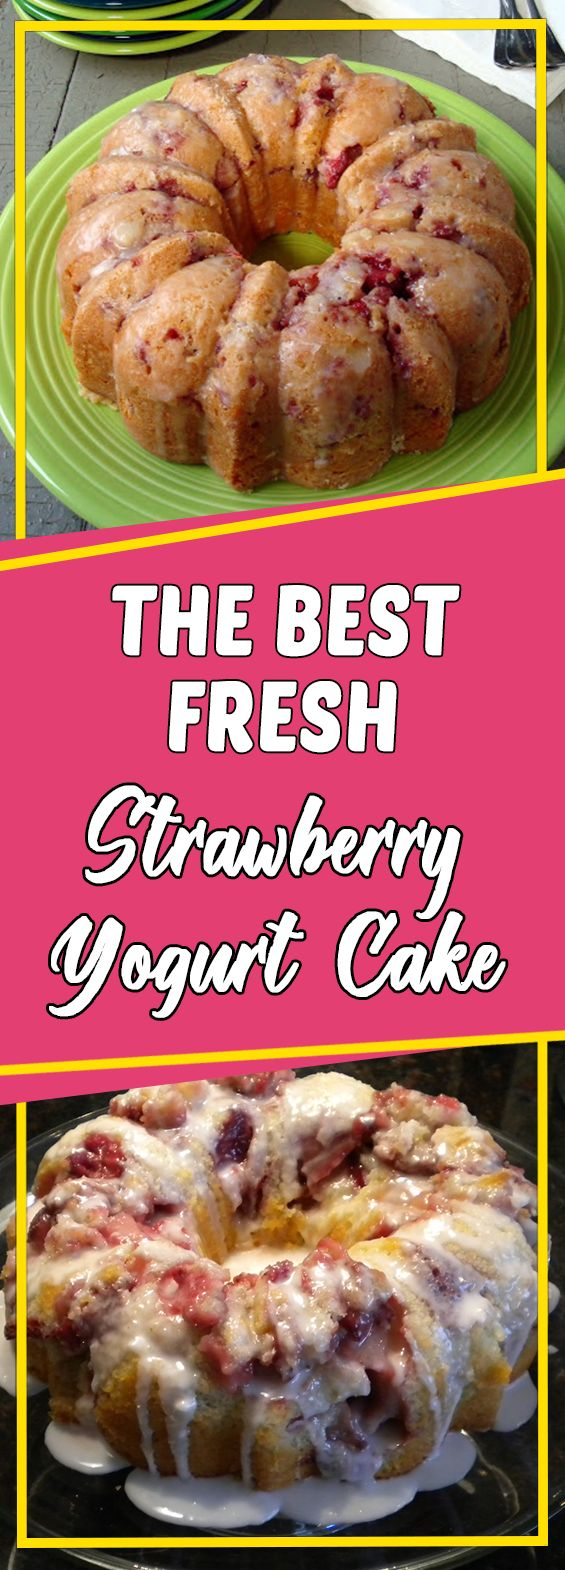 The best Fresh Strawberry Yogurt Cake #dessert #easyrecipes #recipeoftheday #dessertrecipes #desserttable #appetizer